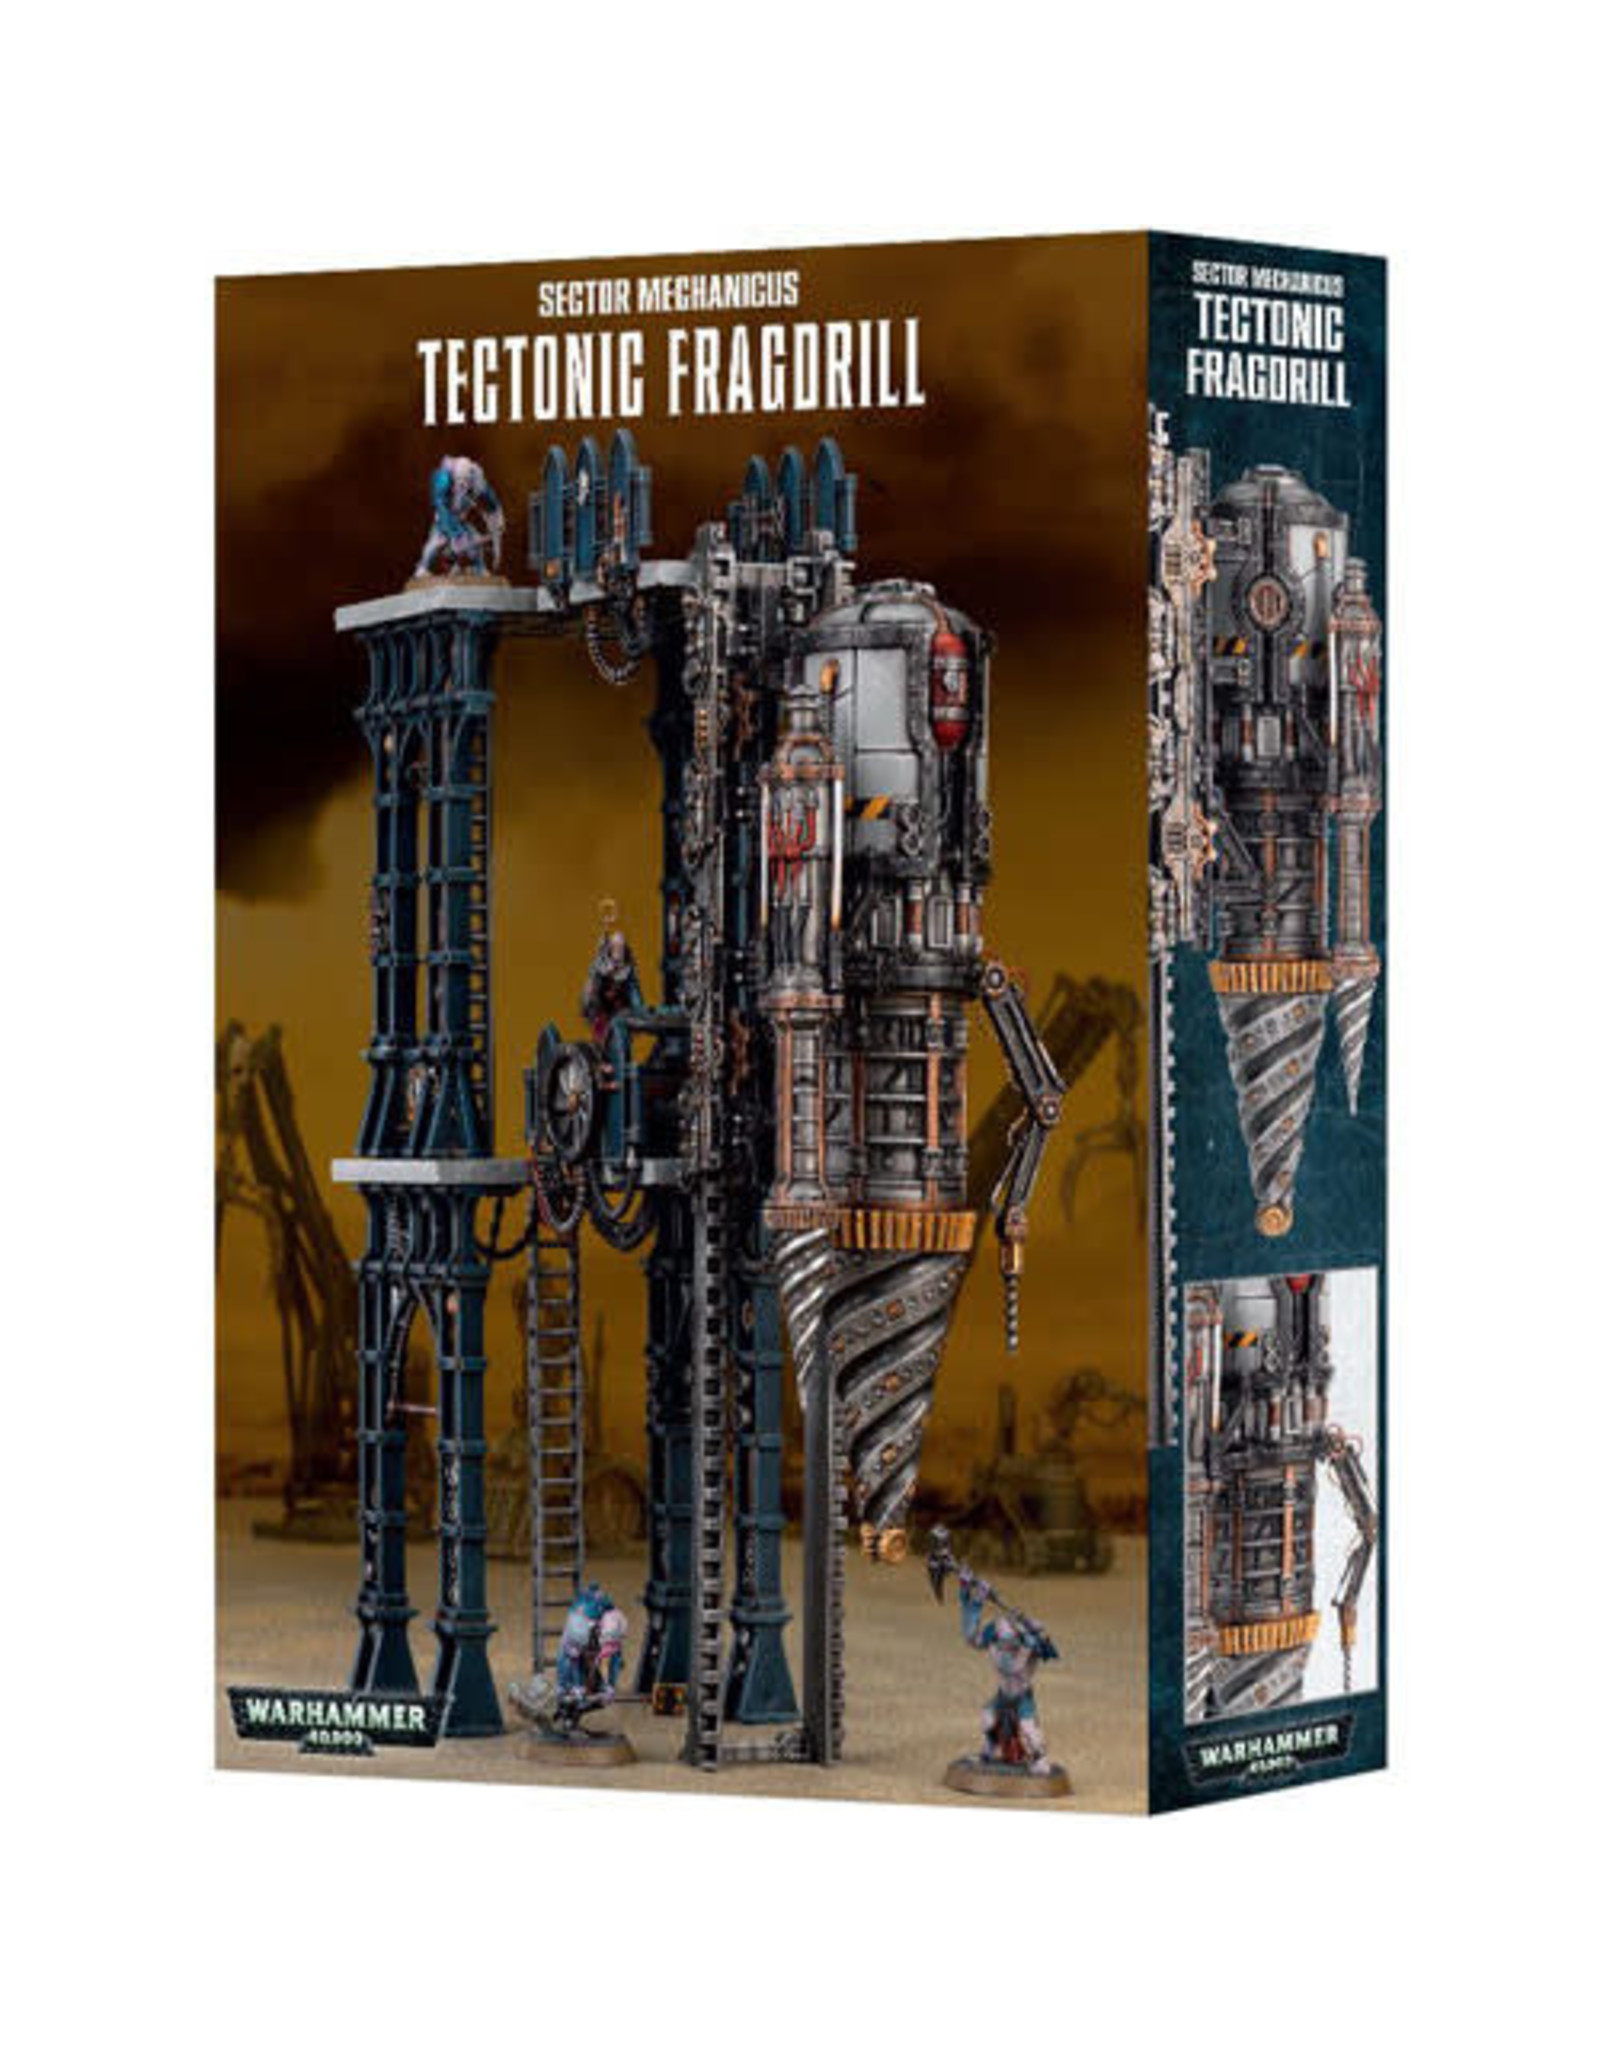 Sector Mechanicus Tectonic Fragdrill (40K)